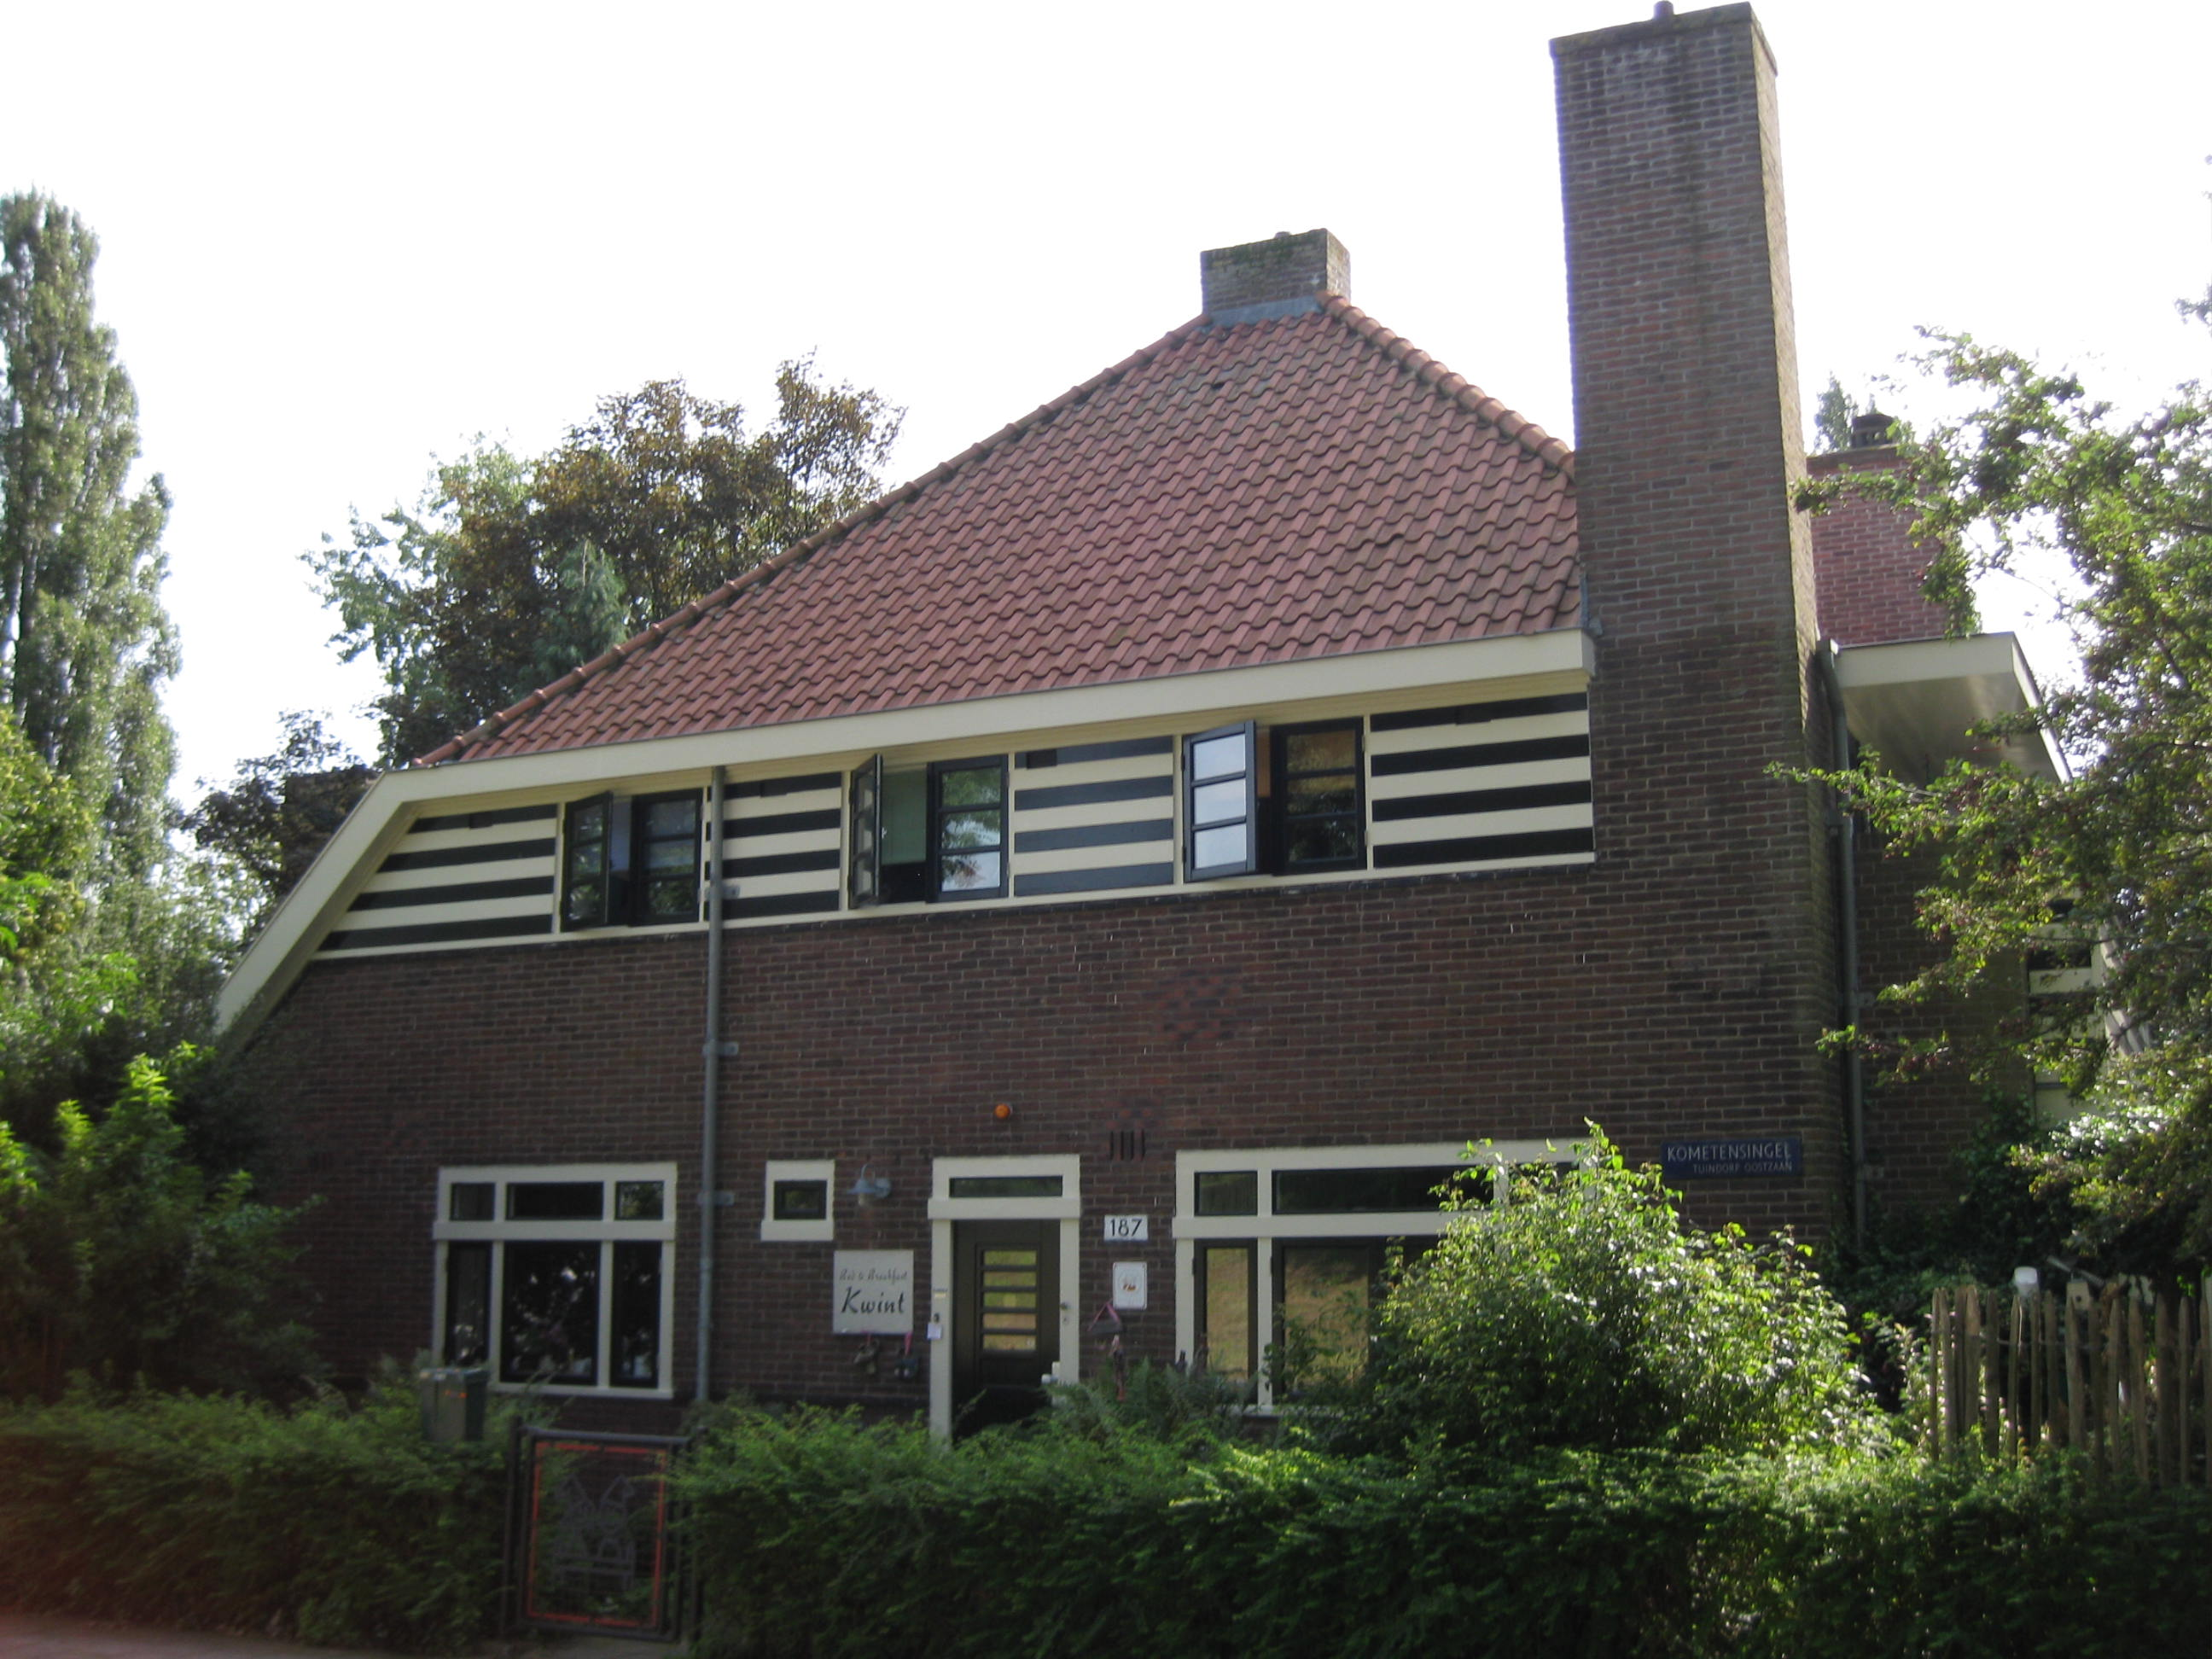 Dokterswoning vrijstaand bouwstijl amsterdamse school bouwstijl